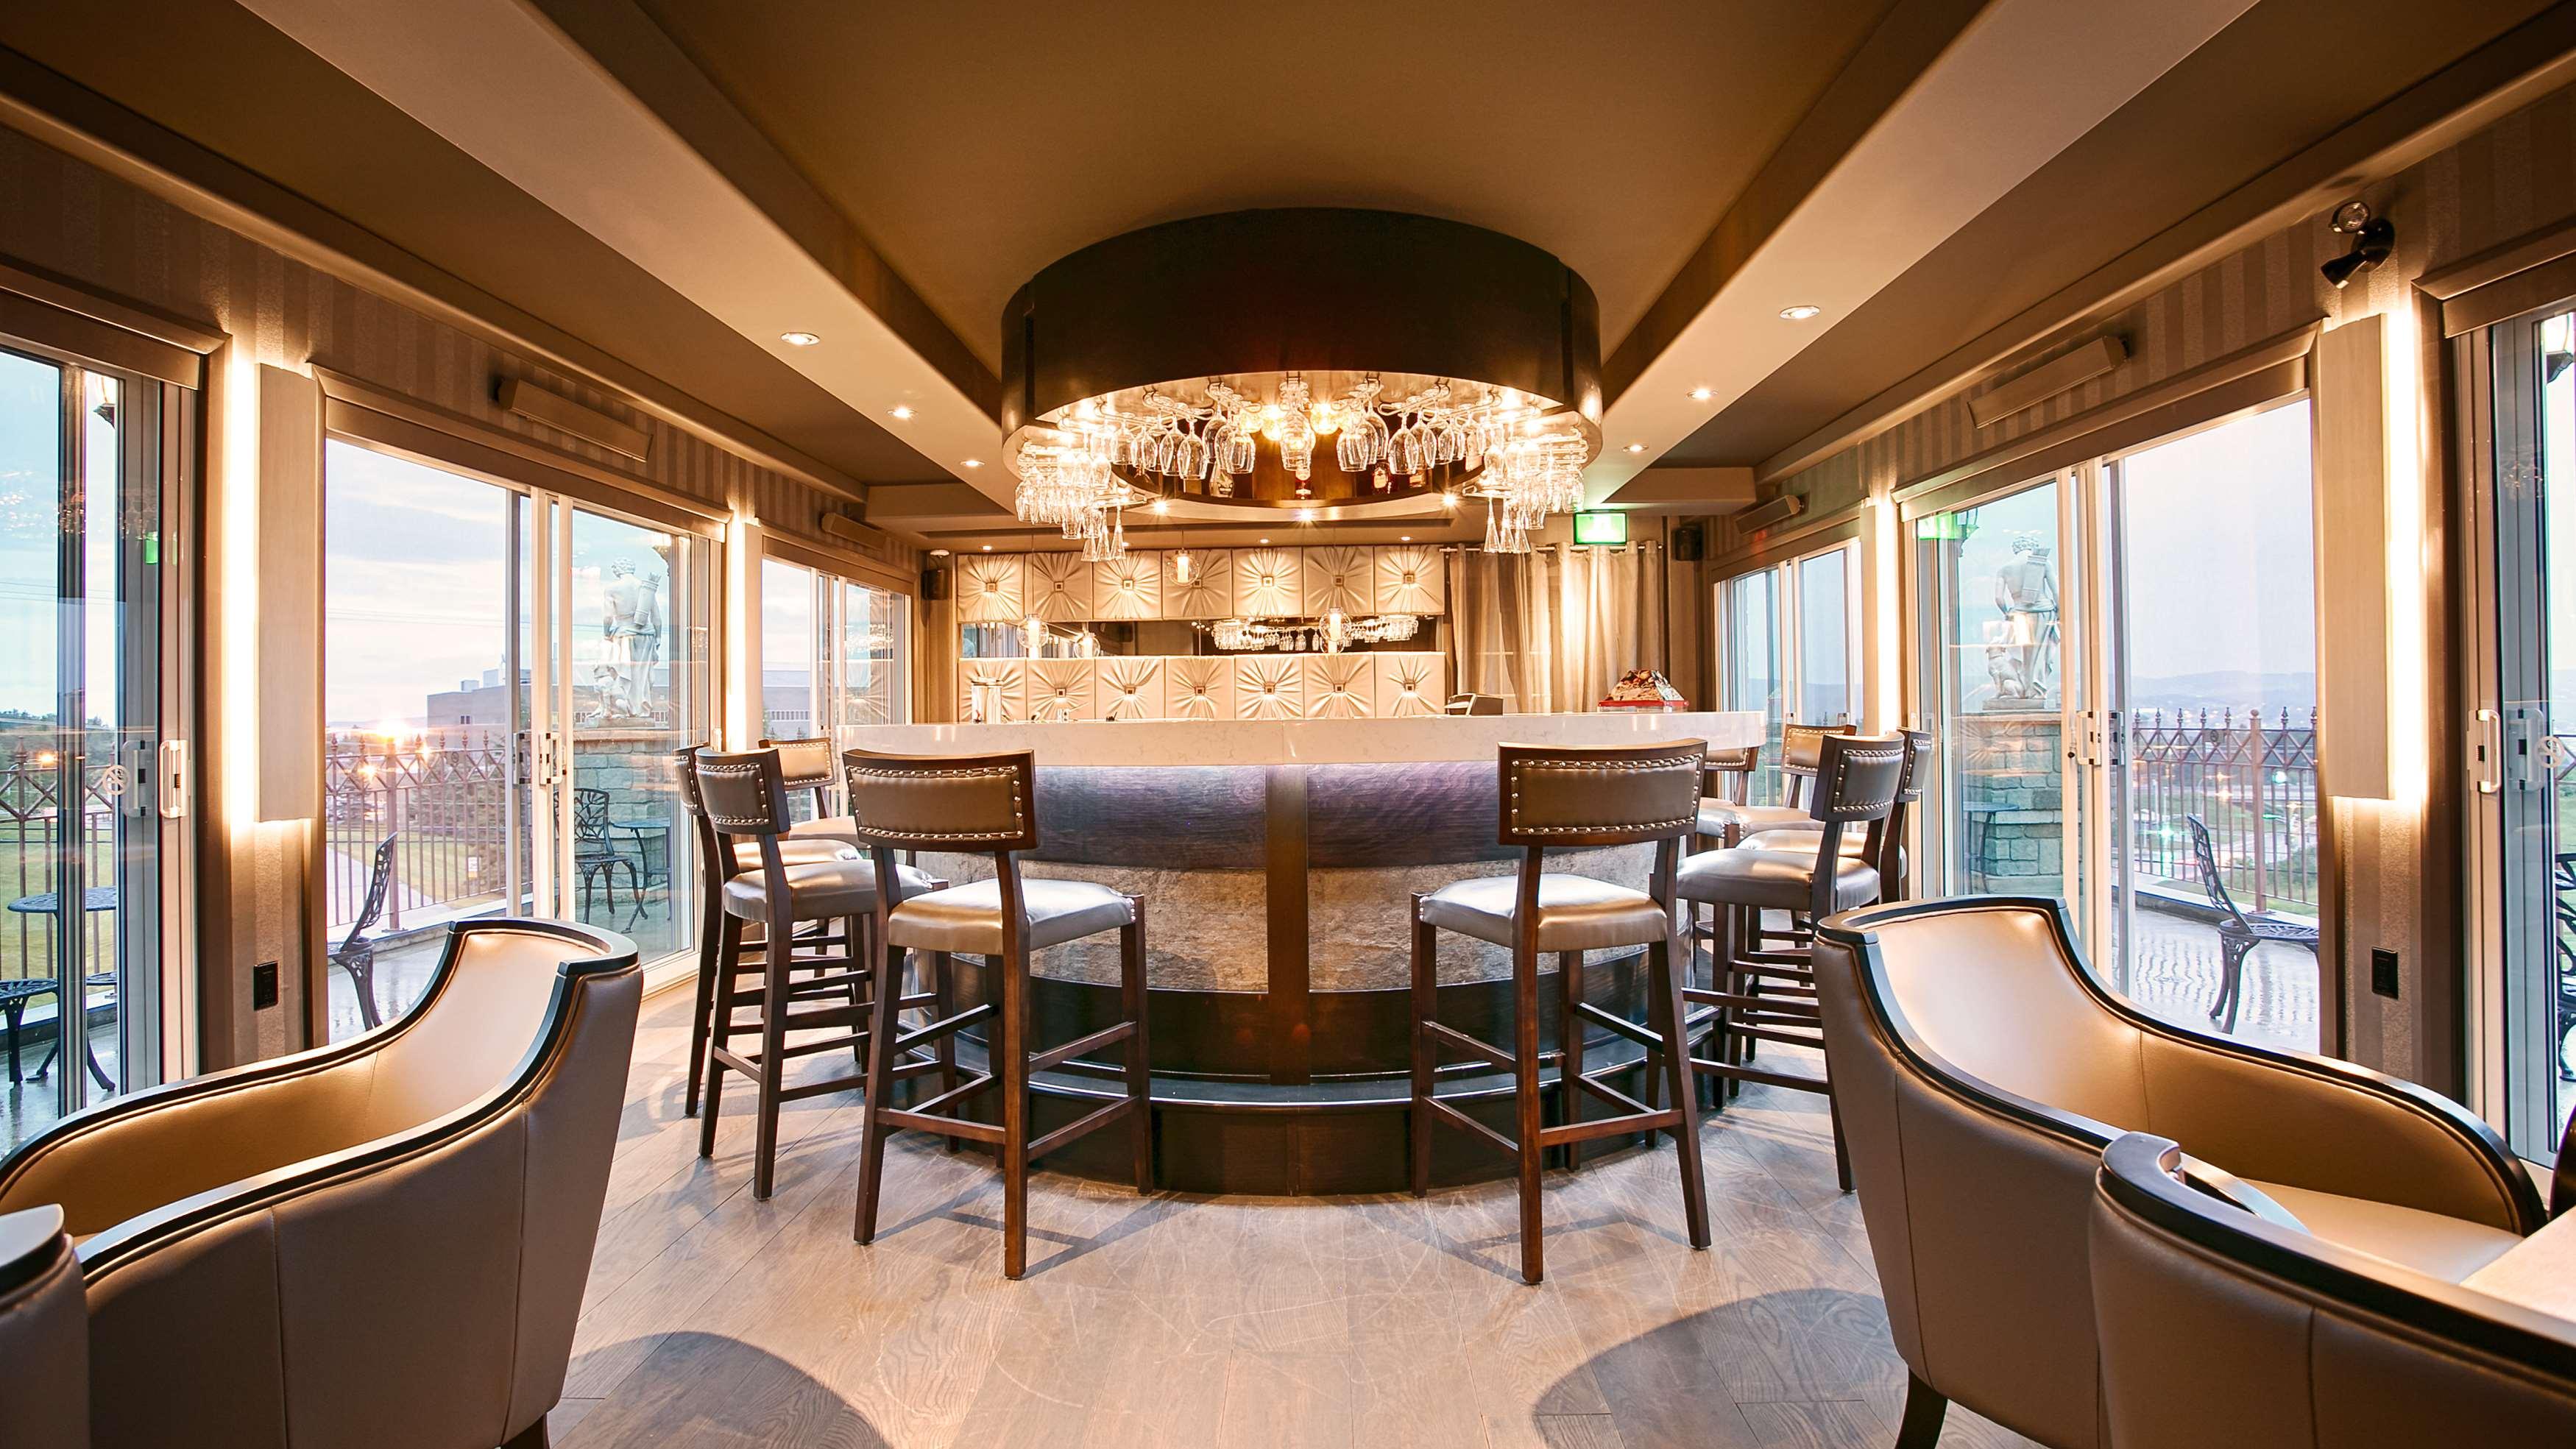 Best Western Plus Edmundston Hotel Edmundston Nb Ourbis